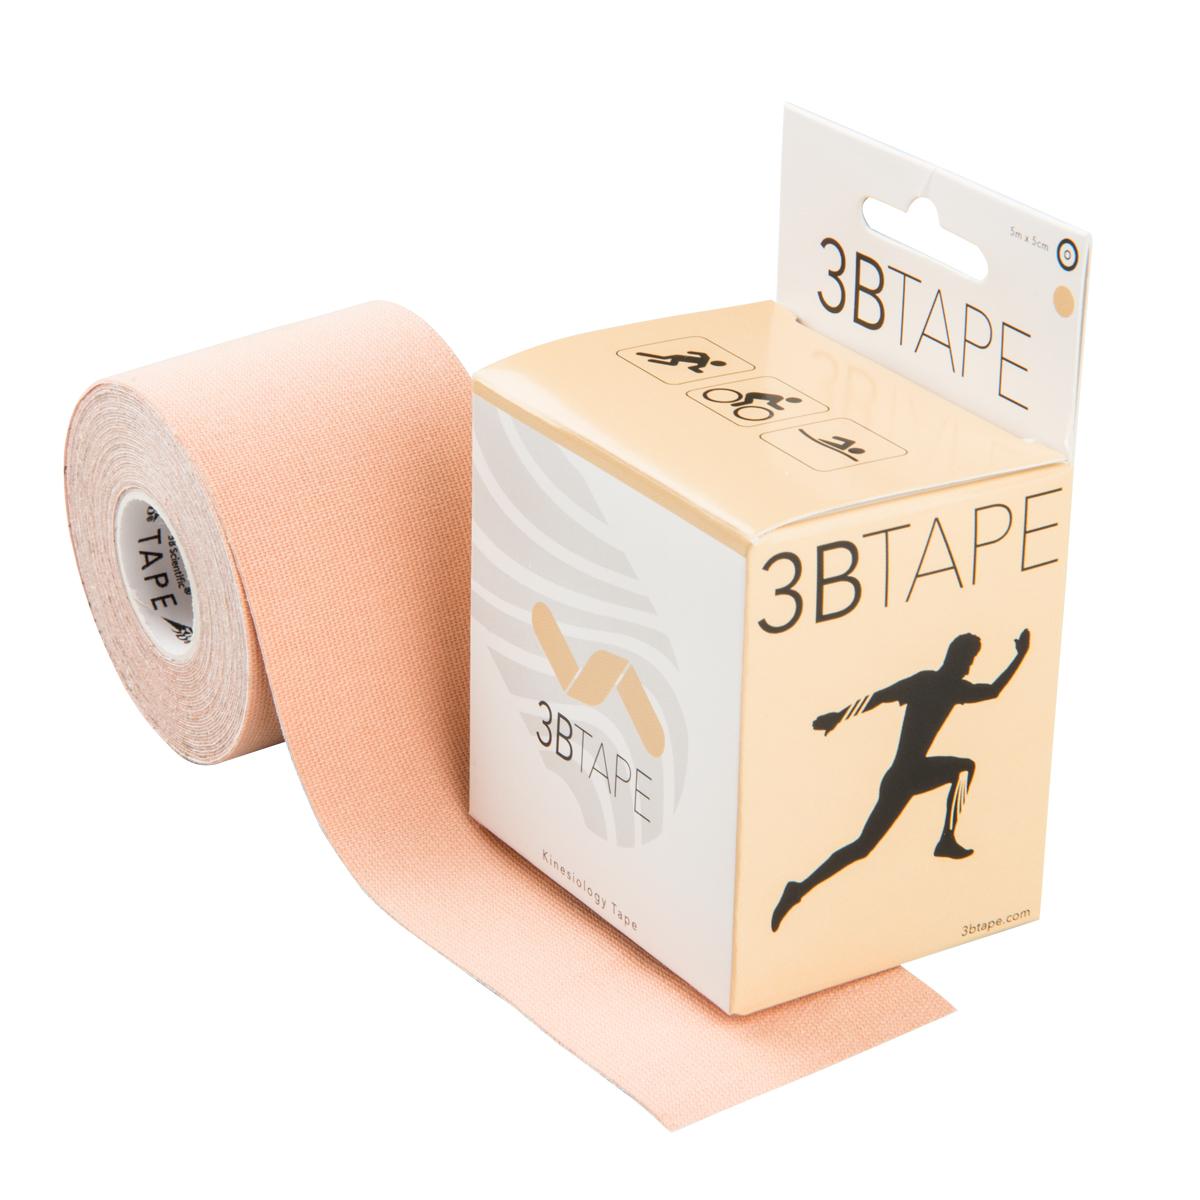 S-3BTBEN_03_1200_1200_3BTAPE-Beige-Kinesiology-Tape